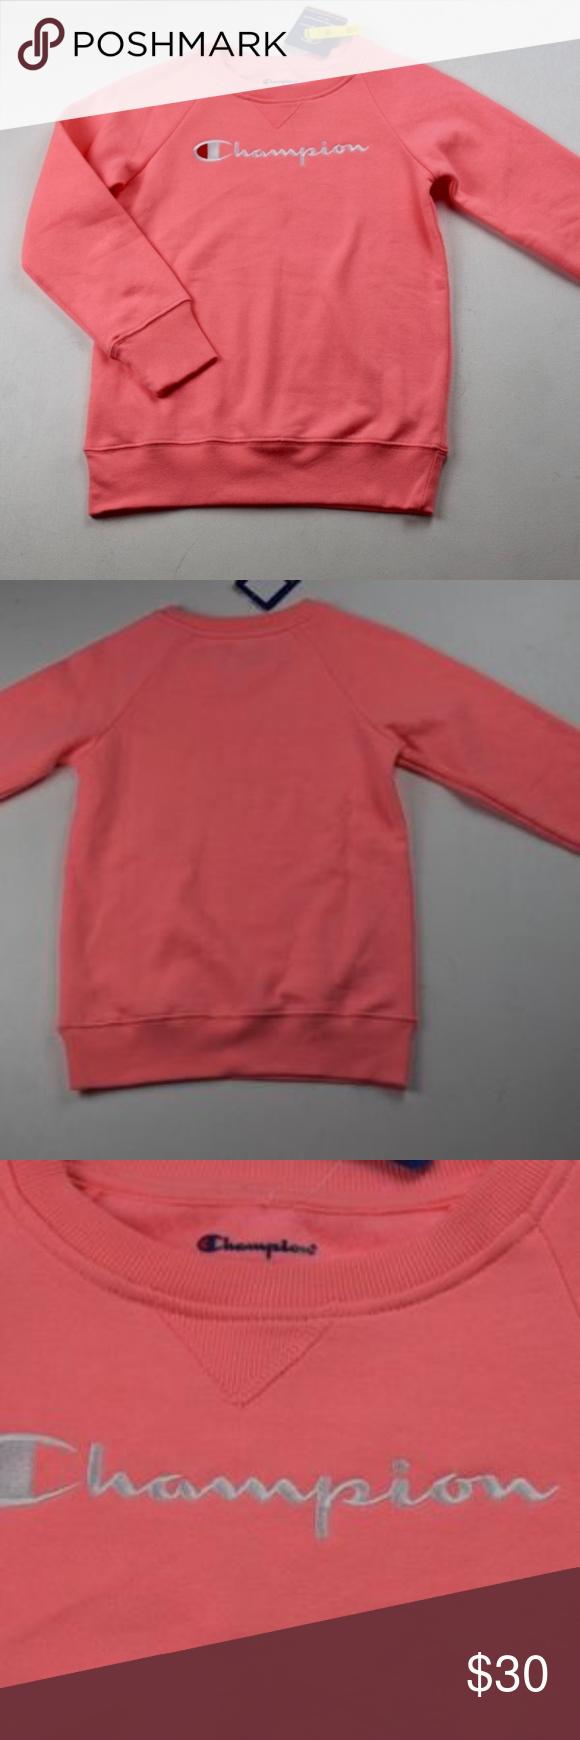 Nwt Girls Champion Sweatshirt Champion Sweatshirt Long Sleeve Tshirt Men Sweatshirts [ 1740 x 580 Pixel ]